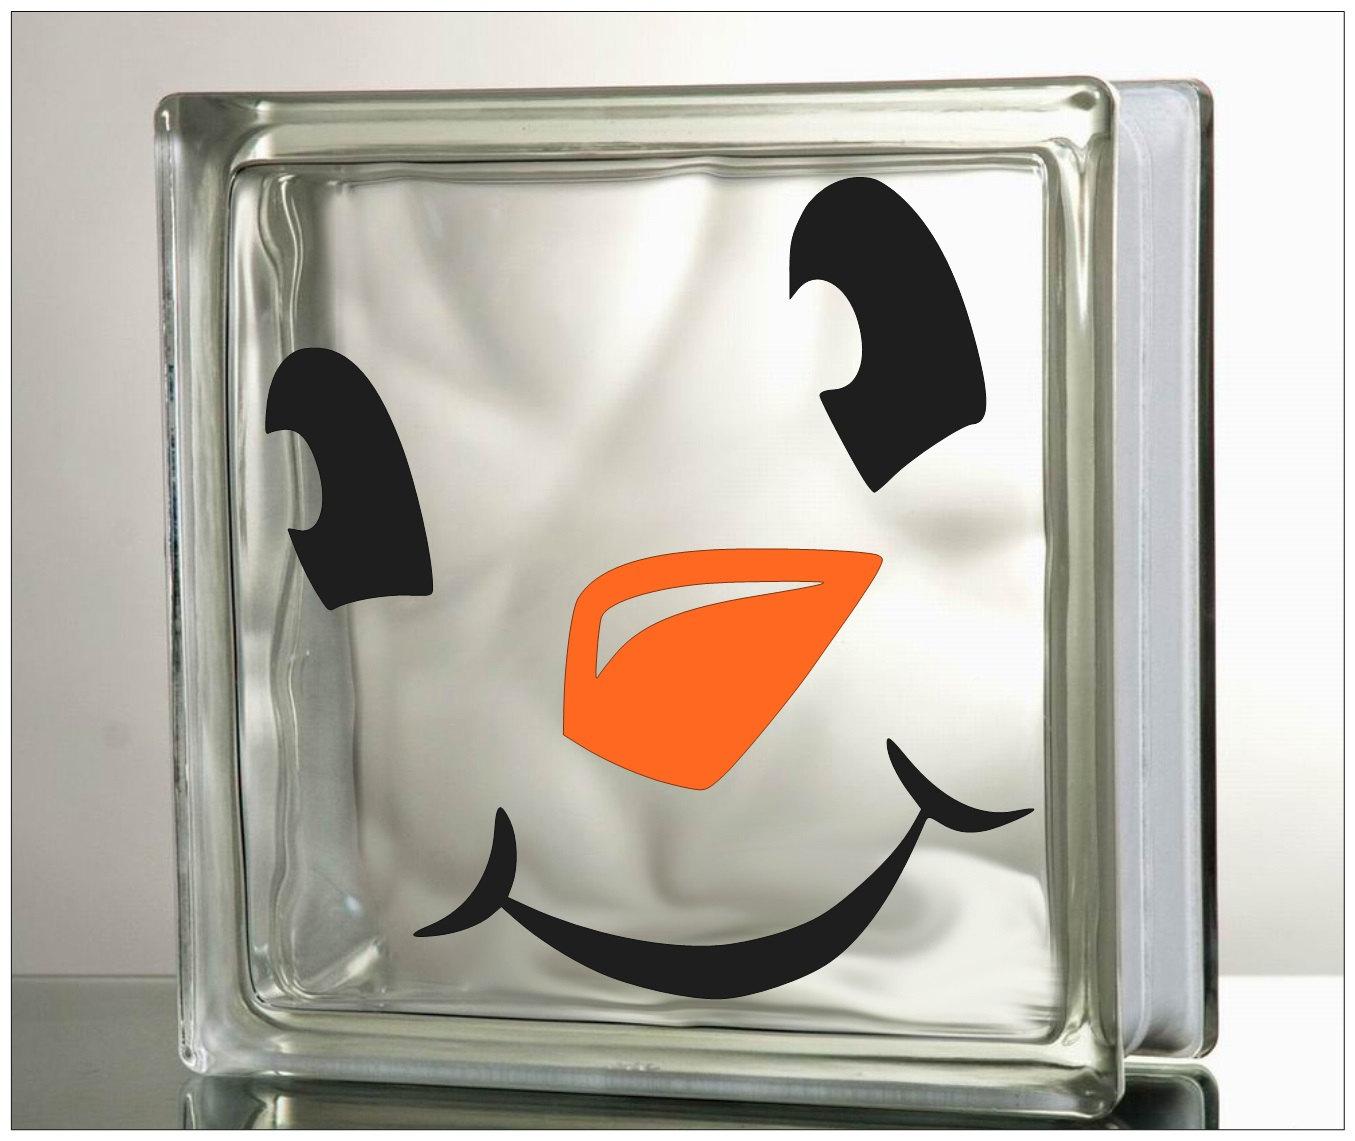 Christmas Vinyl Decals For Glass Blocks